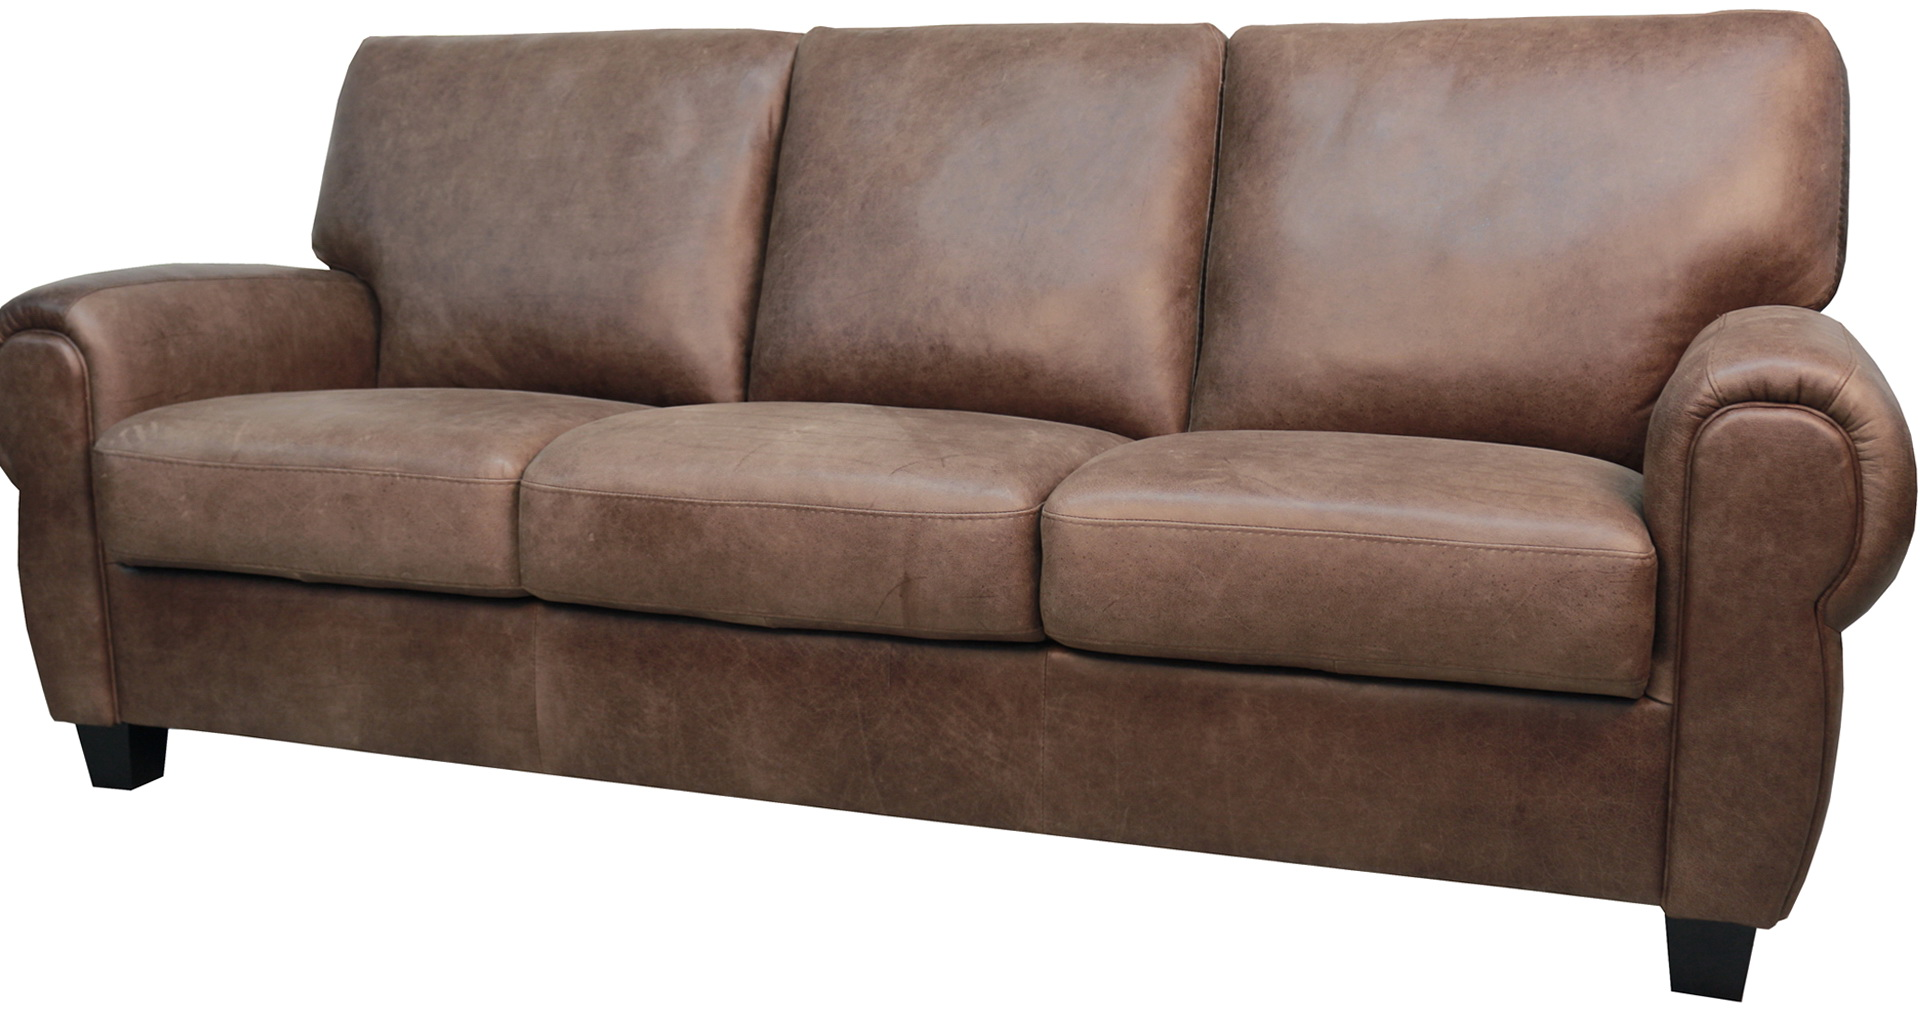 Leather Sofa Repair Houston